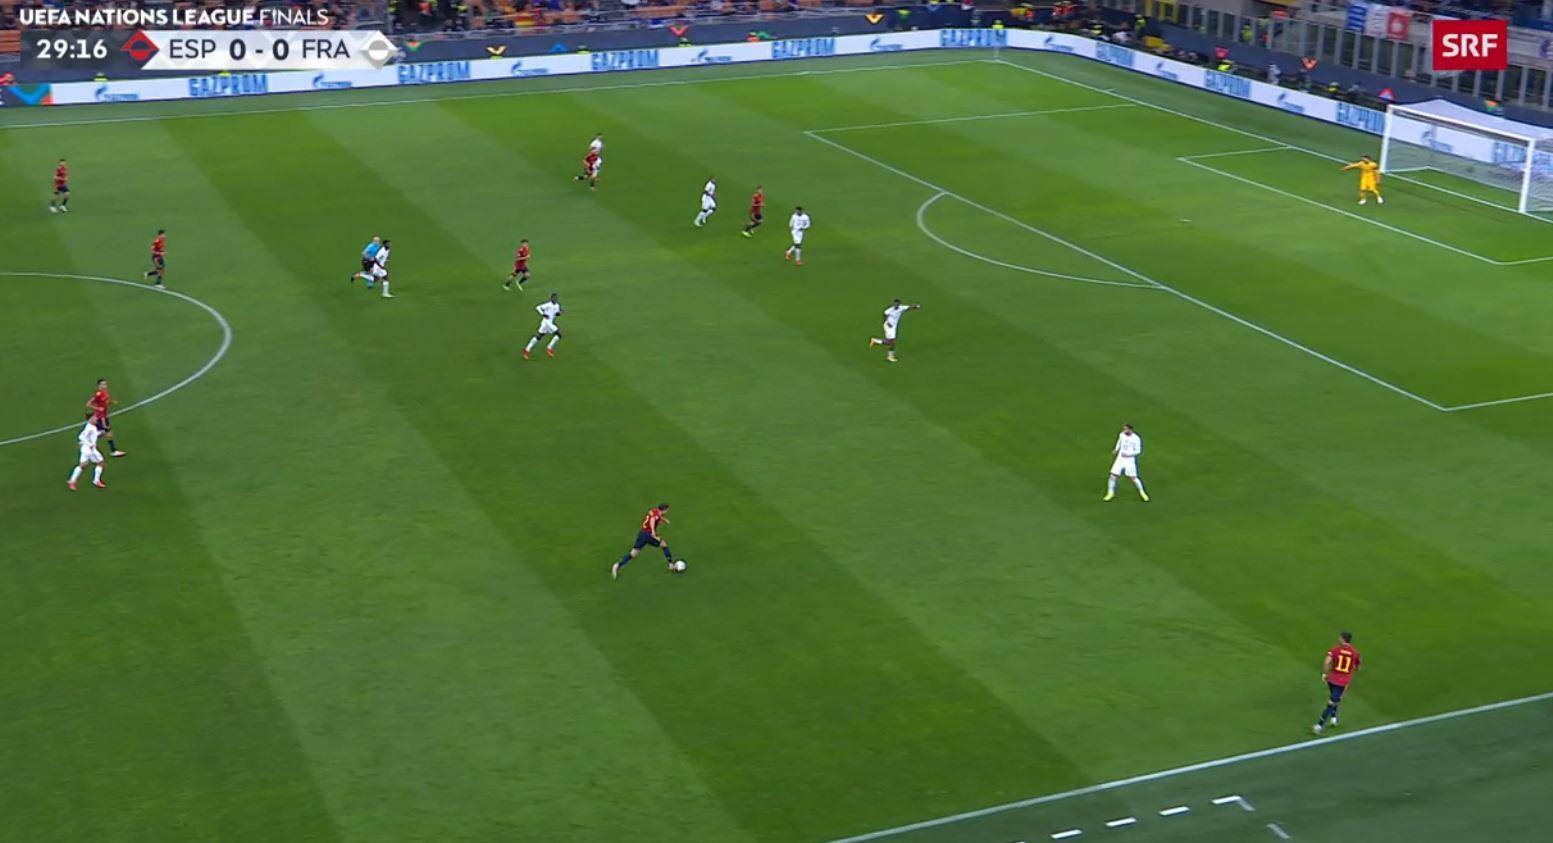 Spain 1-2 France (UEFA Nations League) 2021.10.10 (19h45) Full Goals Highlight